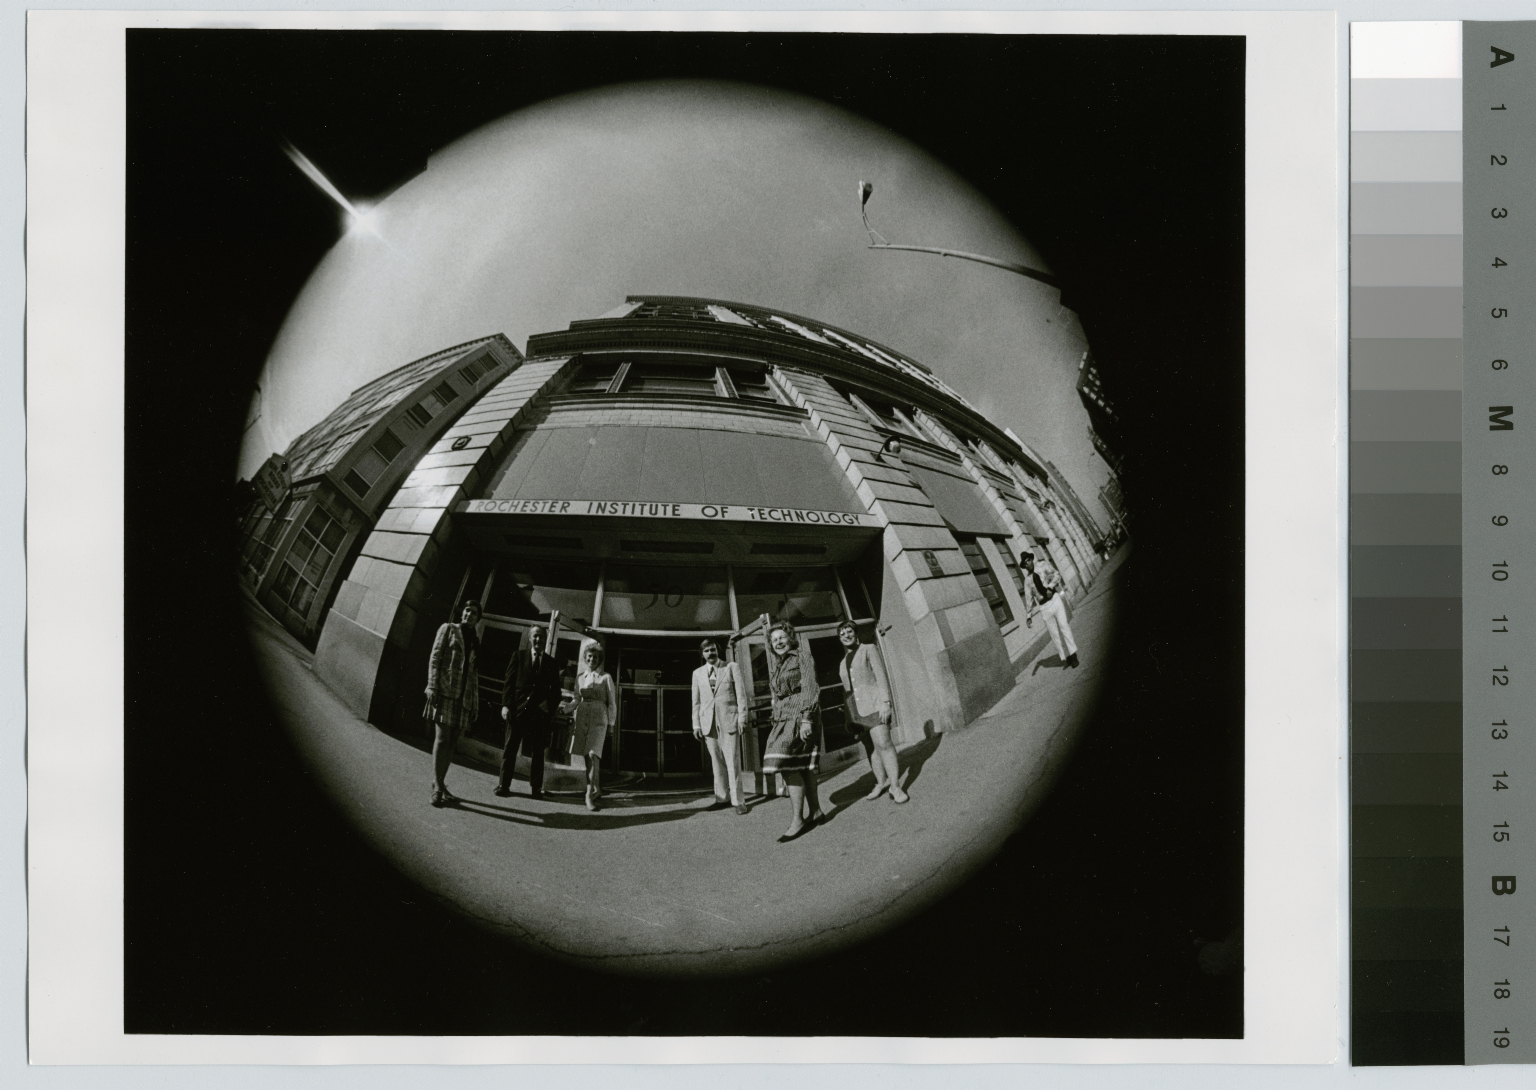 Fisheye lens photograph for invitation, open house, Rochester Institute of Technology